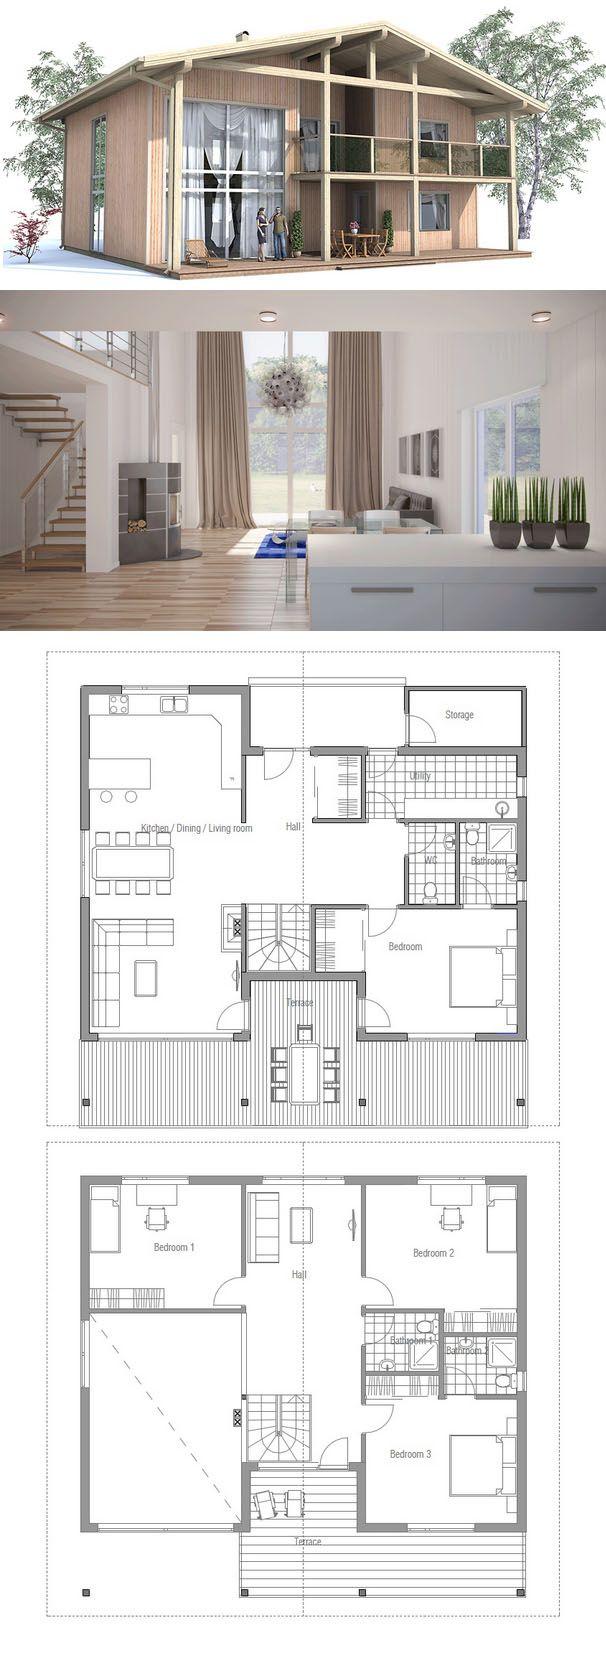 Home Plan House Plan Three Bedroom House Plan Small House Plans House Plans Container House Plans